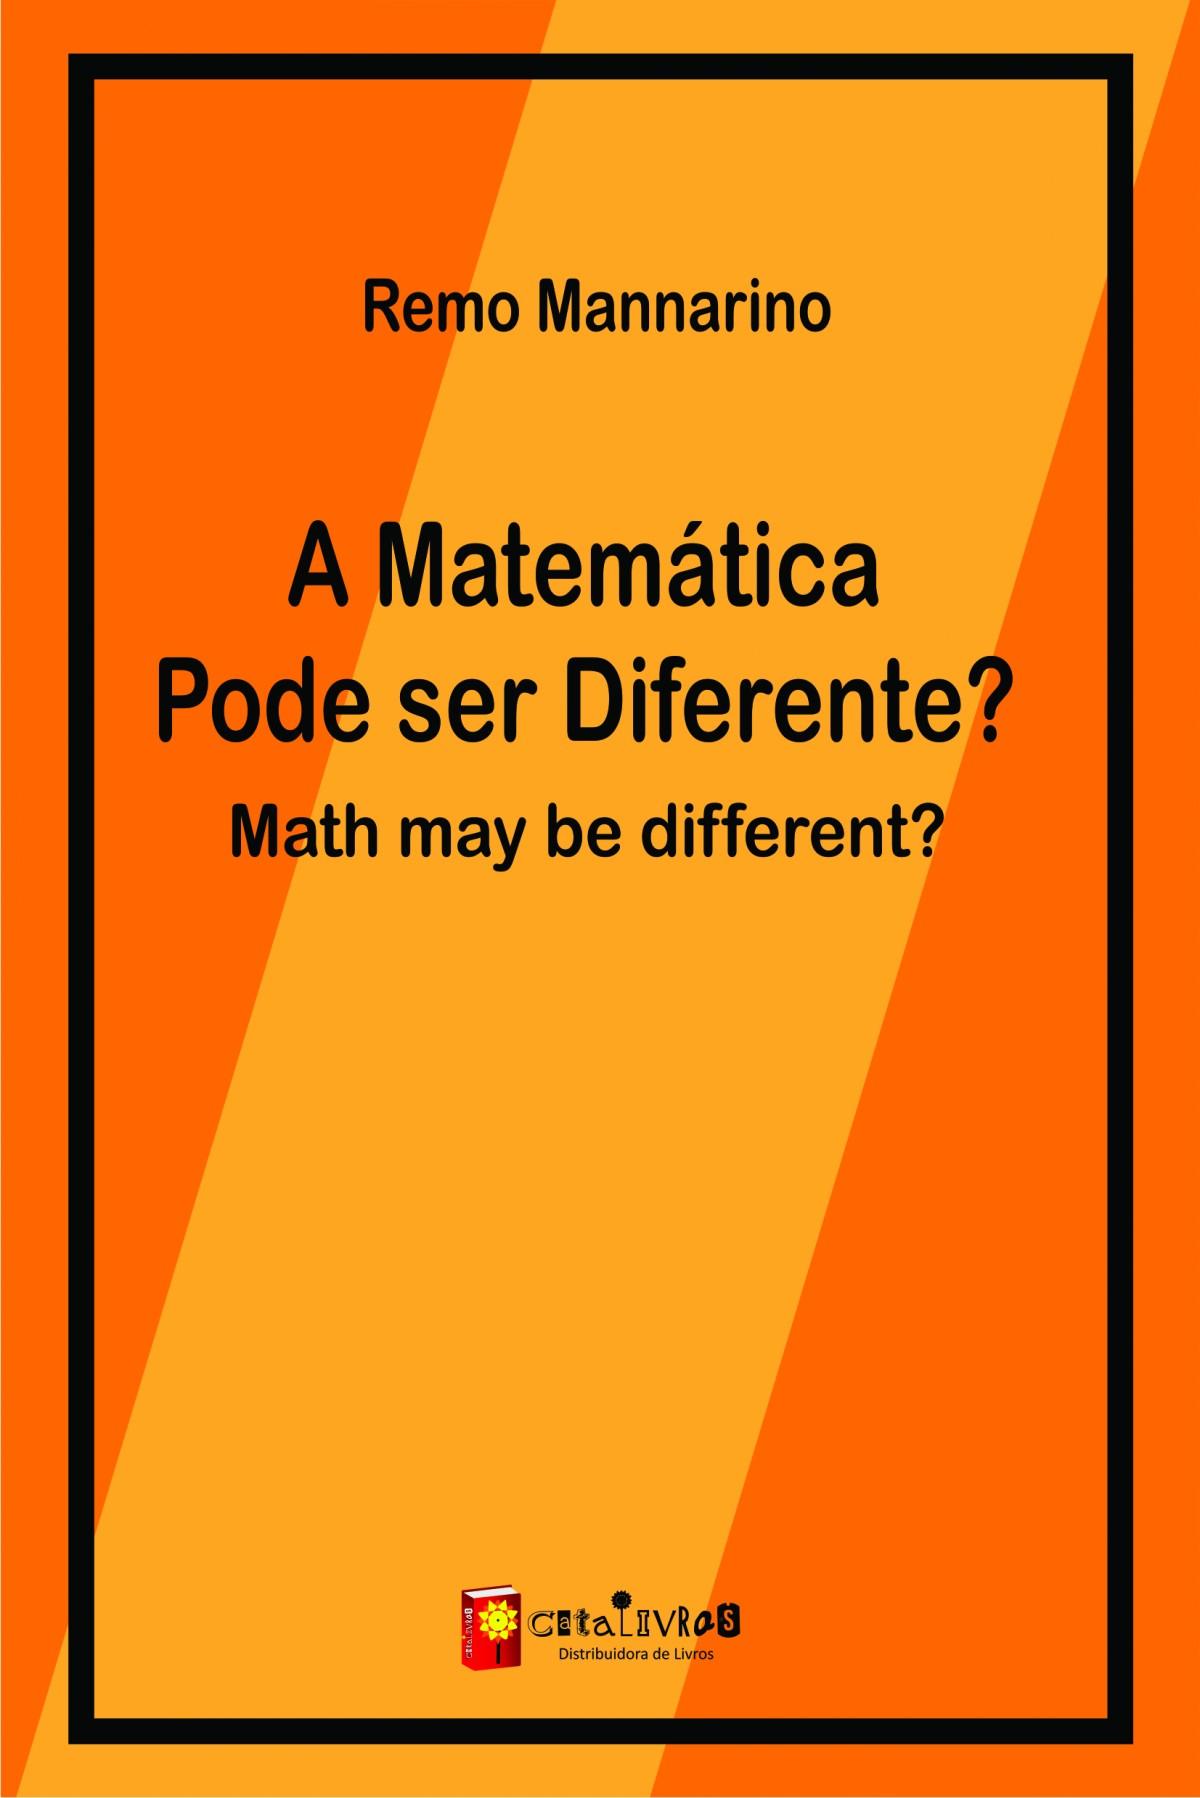 Foto 1 - A Matemática pode ser Diferente? Math may be different?